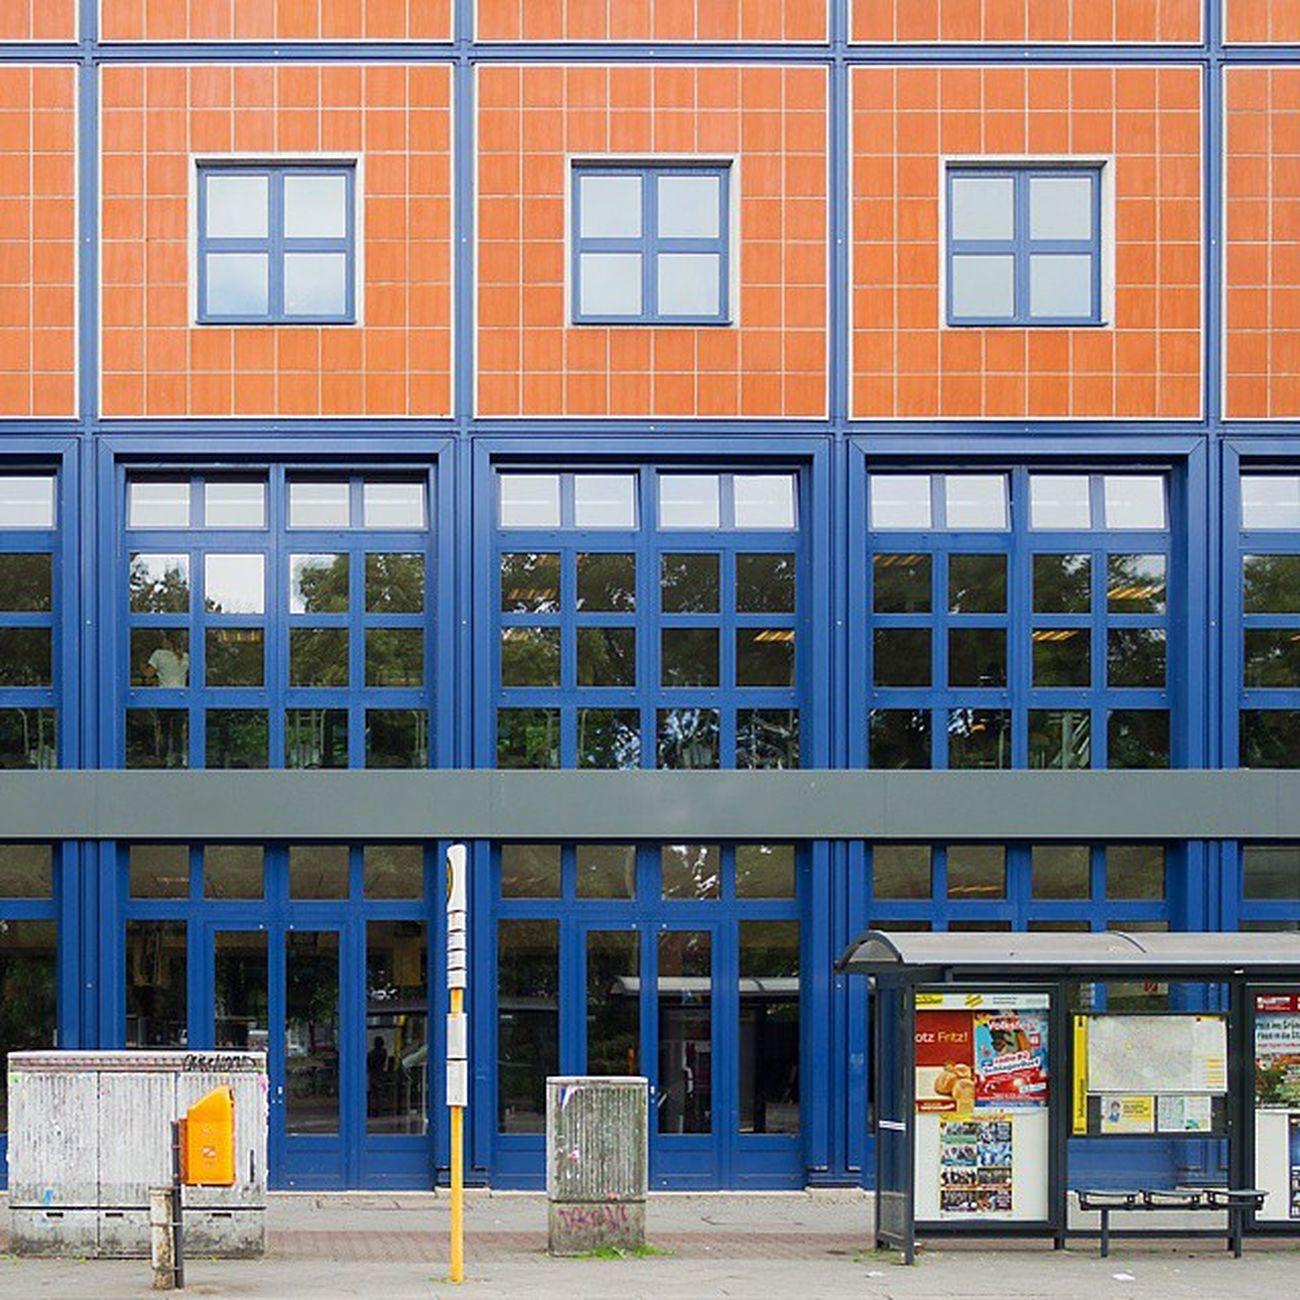 Moabit Berlinmoabit Altmoabit Altmoabit91 von den architekten Ganzundrolfes 1993 Focusteleport Kachelromantik Quadratischpraktischgut Quadratischpraktisch Quadratischpraktischarchitektur